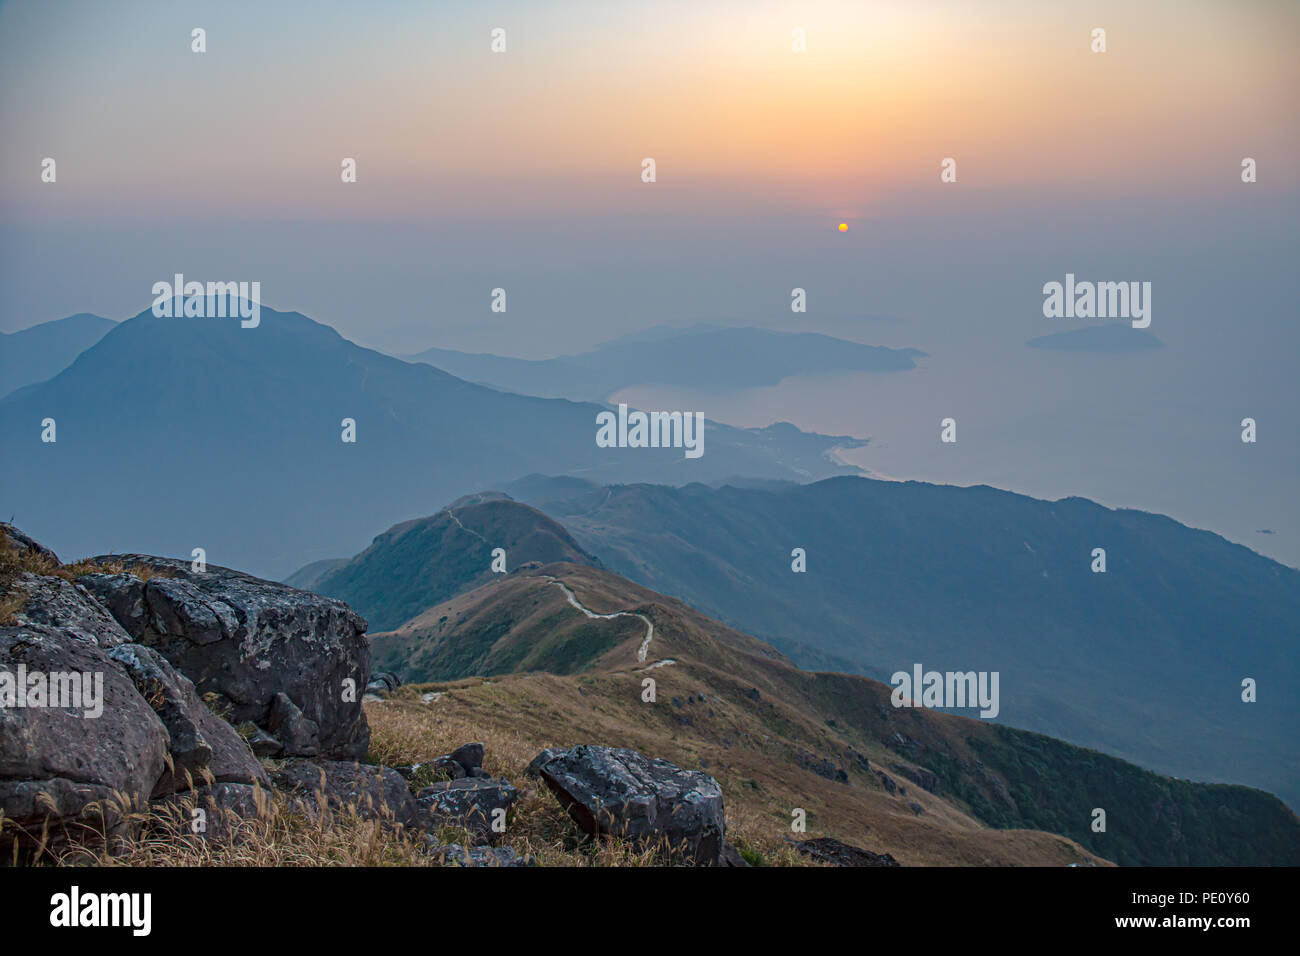 sea, mountain range and hiking trail view from lantau peak, Lantau island, Hong Kong at sunrise in winter season with copy space - Stock Image